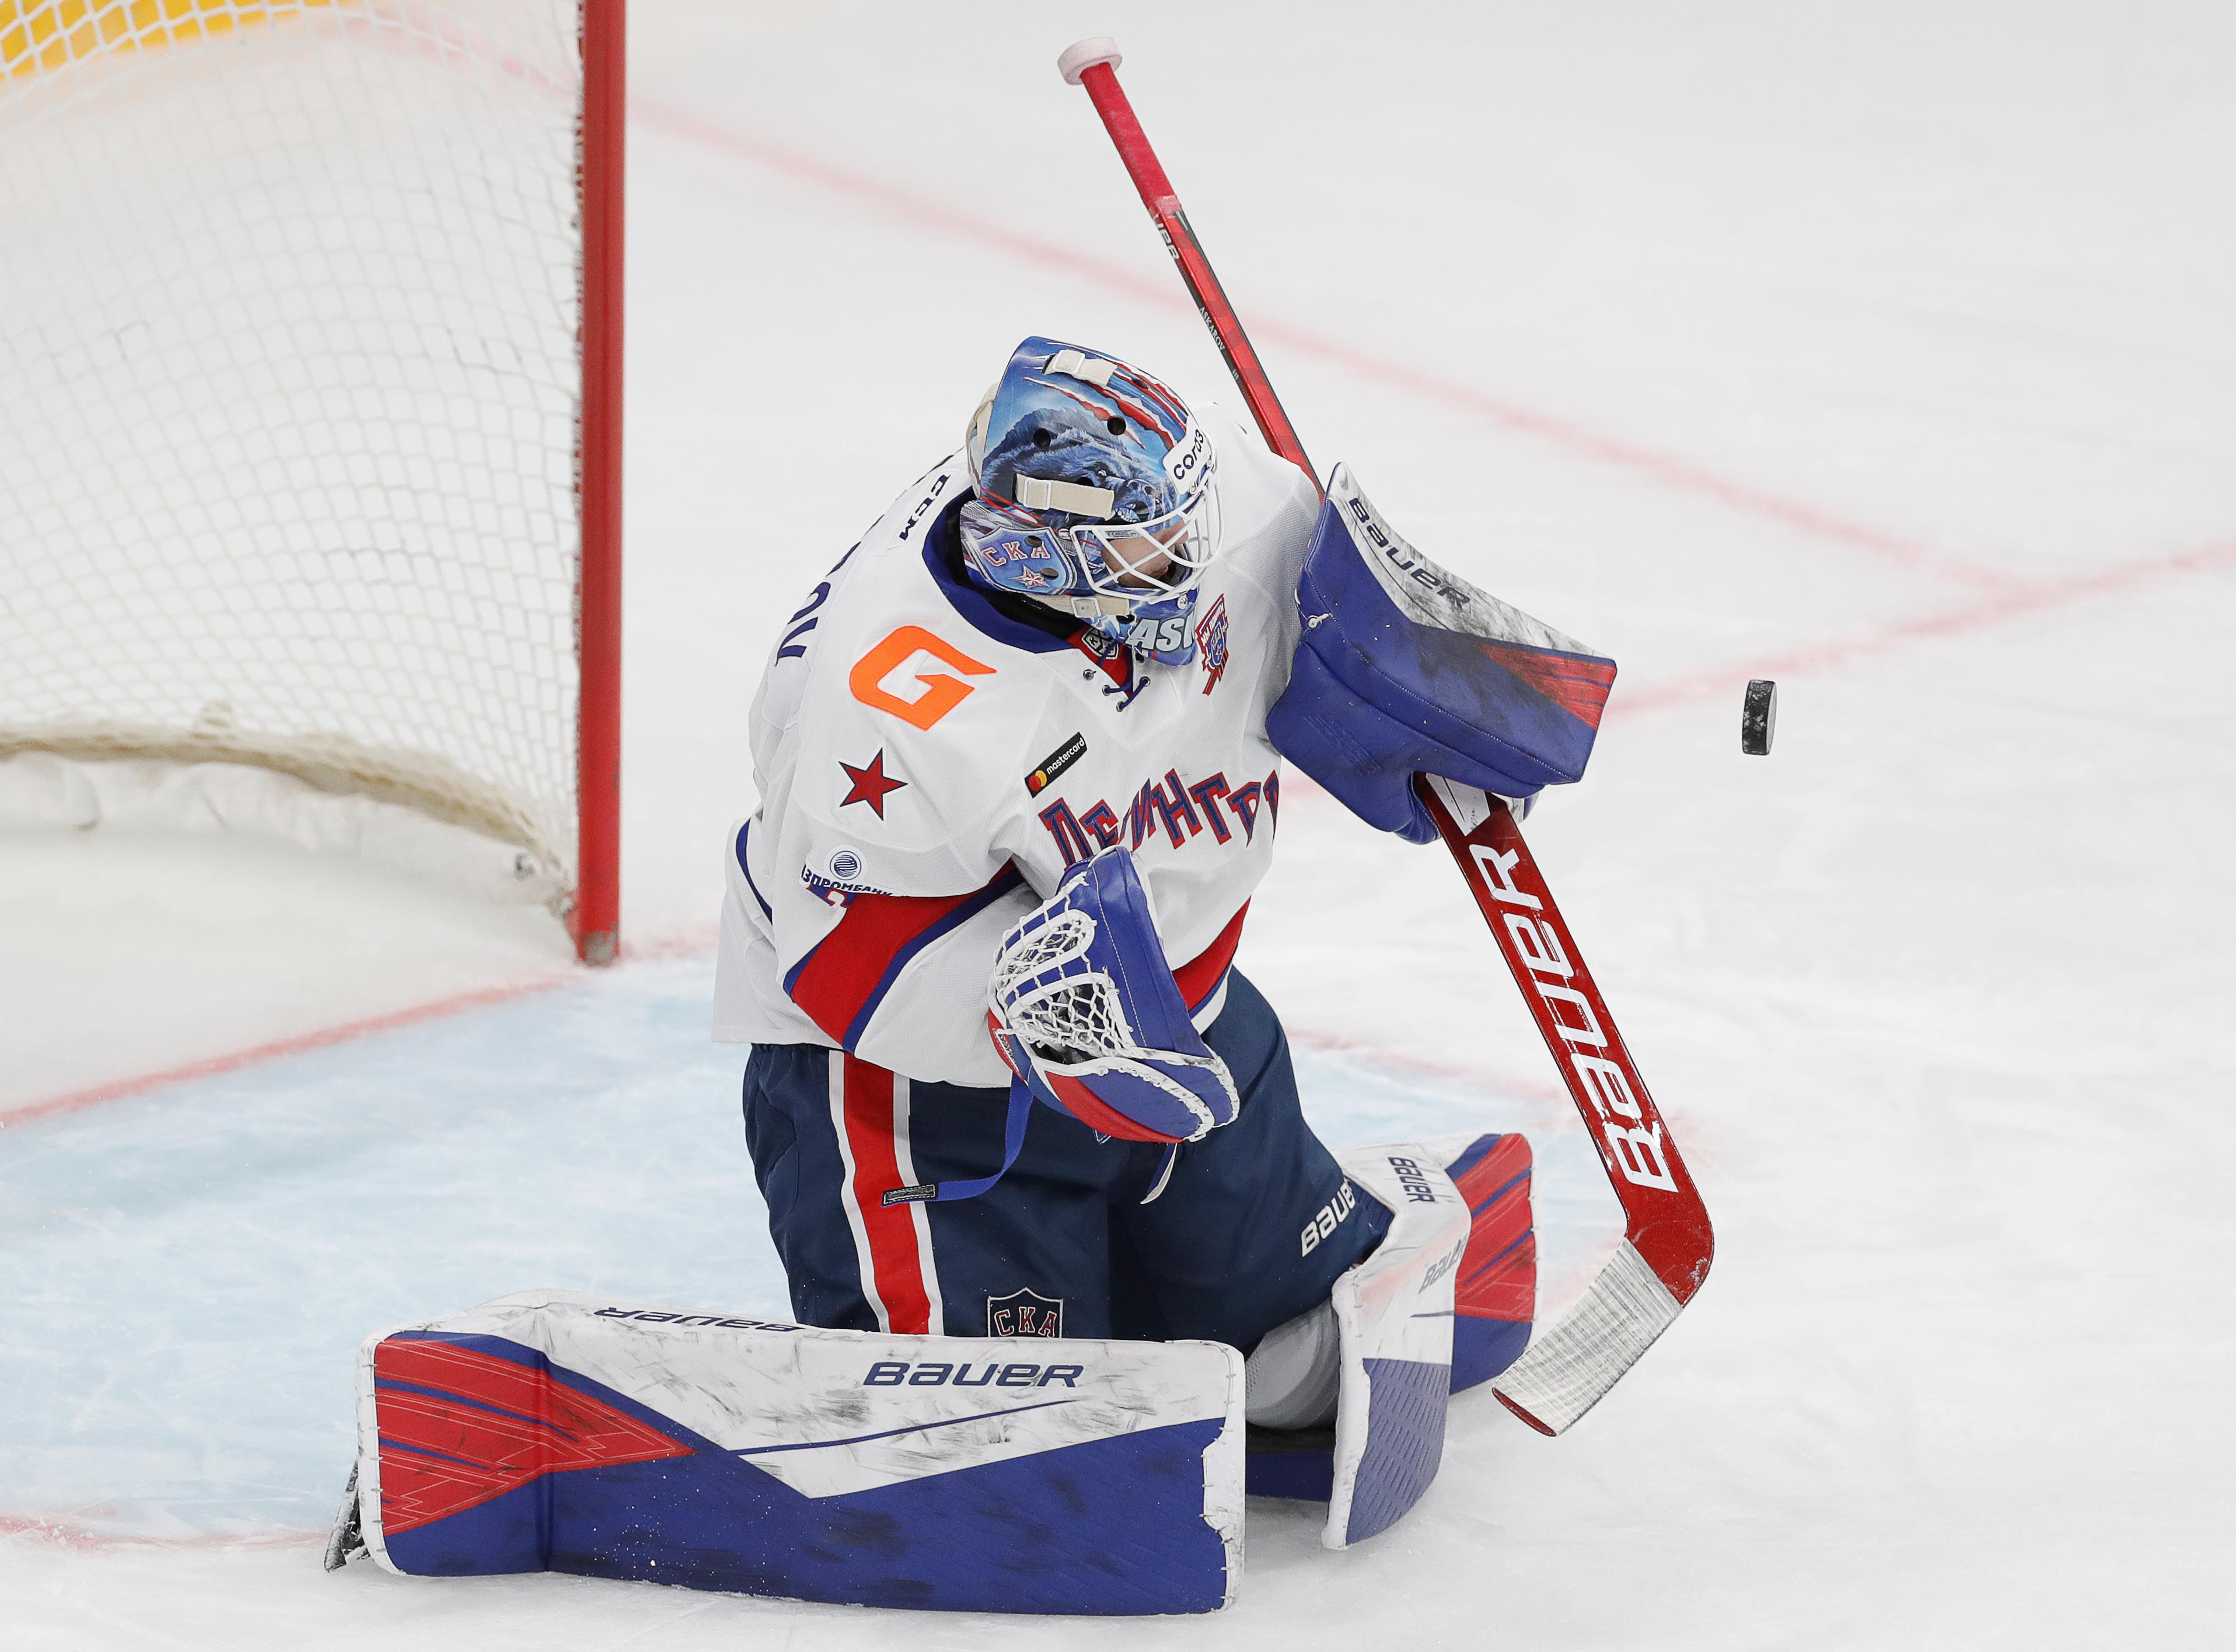 2020/2021 Kontinental Hockey League: CSKA Moscow 3 - 1 SKA St Petersburg